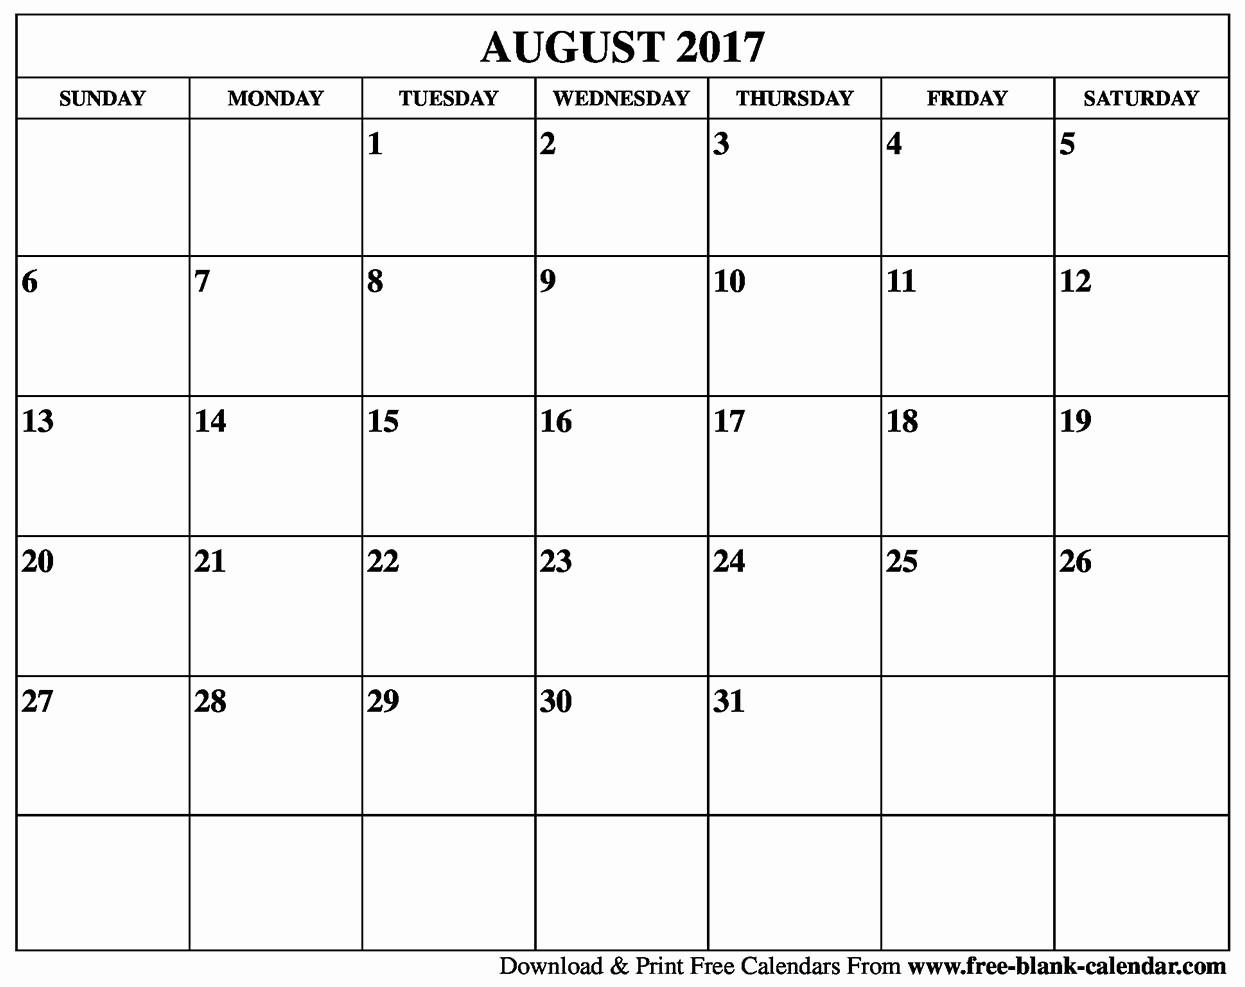 Free Blank Printable Calendar 2017 Luxury Blank August 2017 Calendar Printable